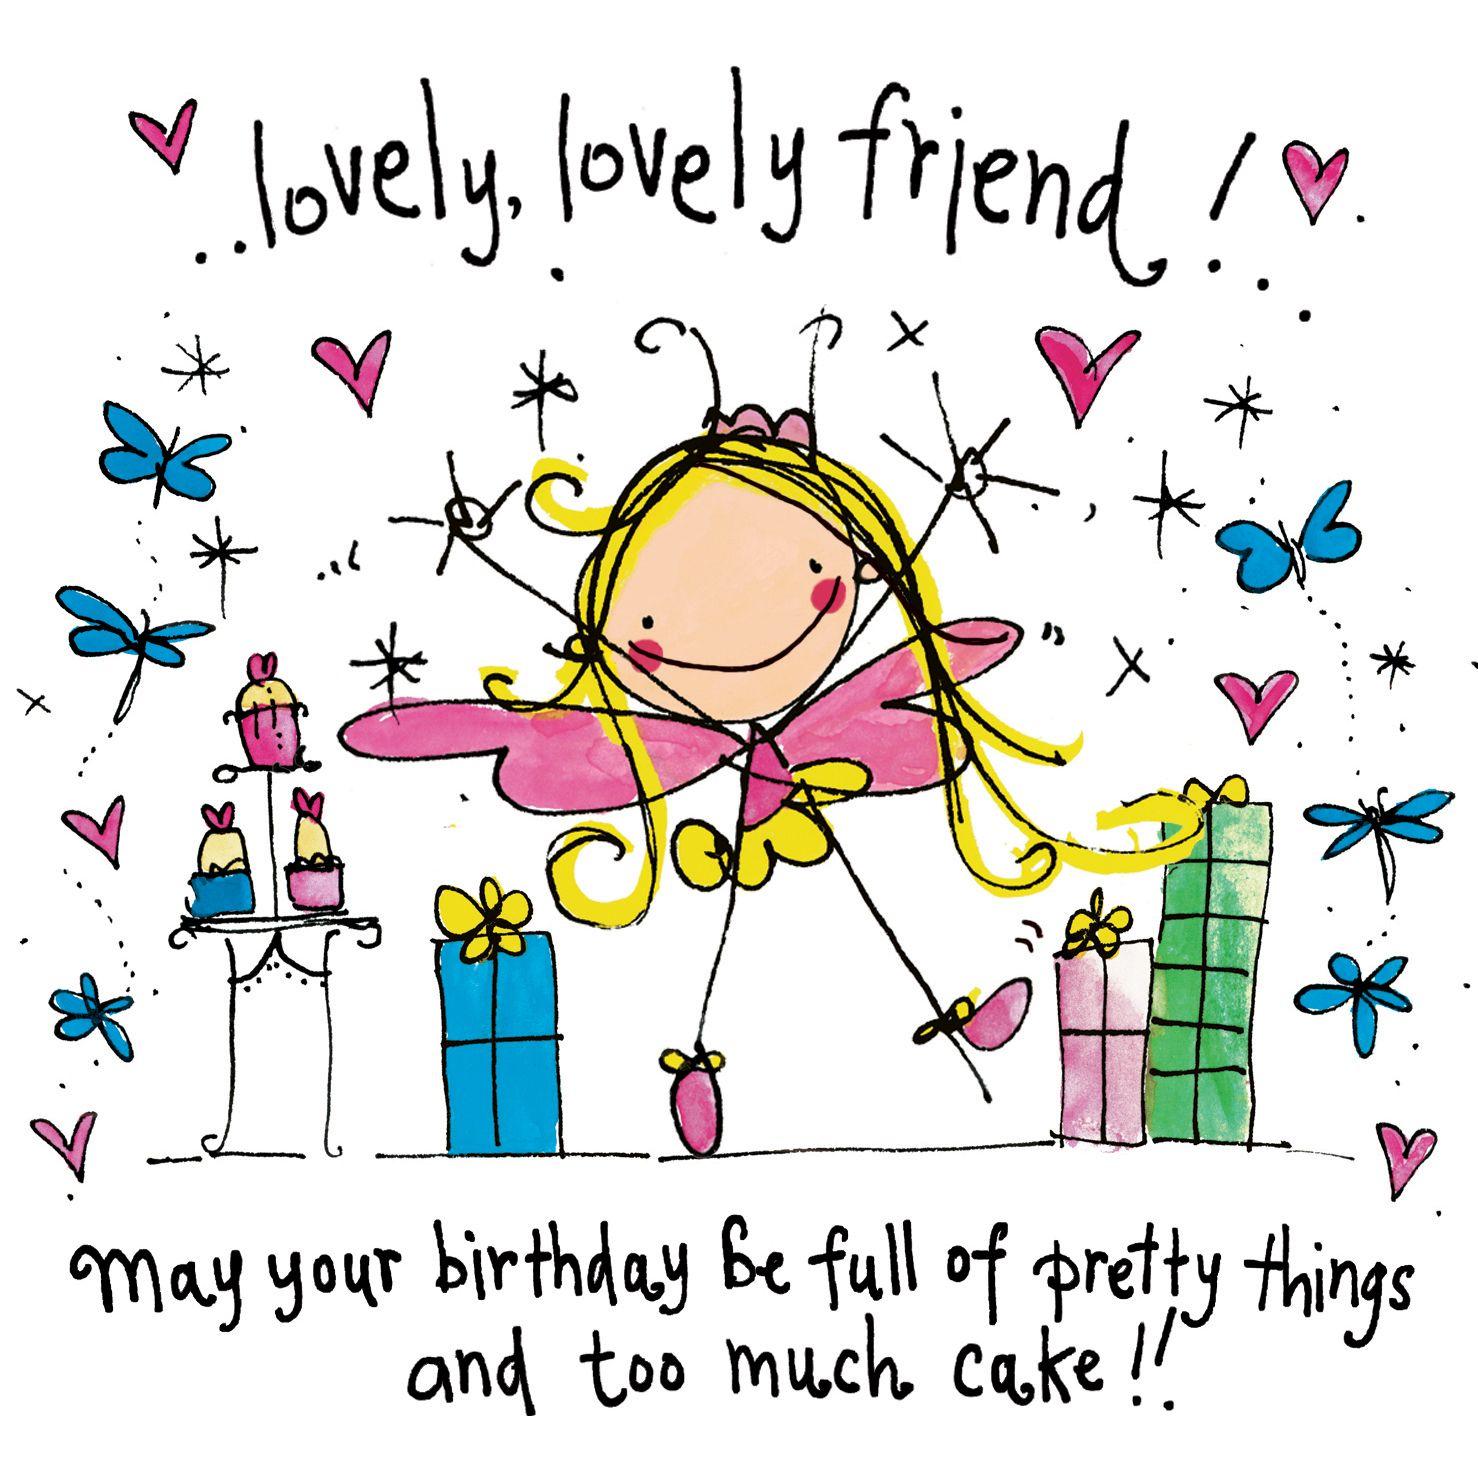 Happy Birthday Friend, Happy